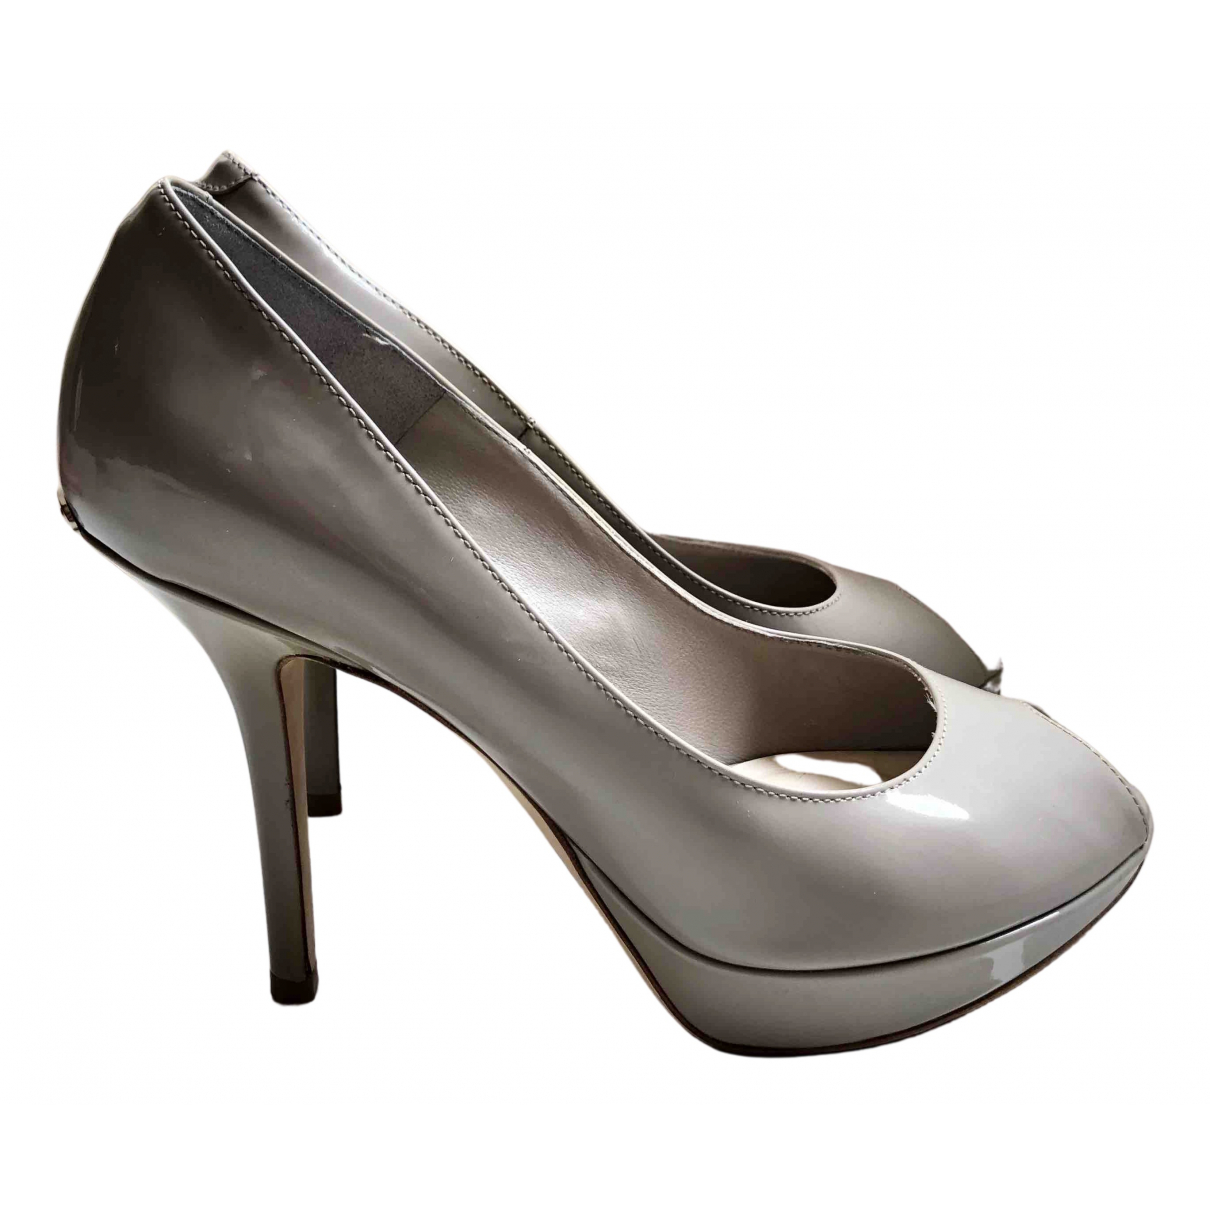 Dior - Escarpins Miss Dior Peep Toes pour femme en cuir verni - gris